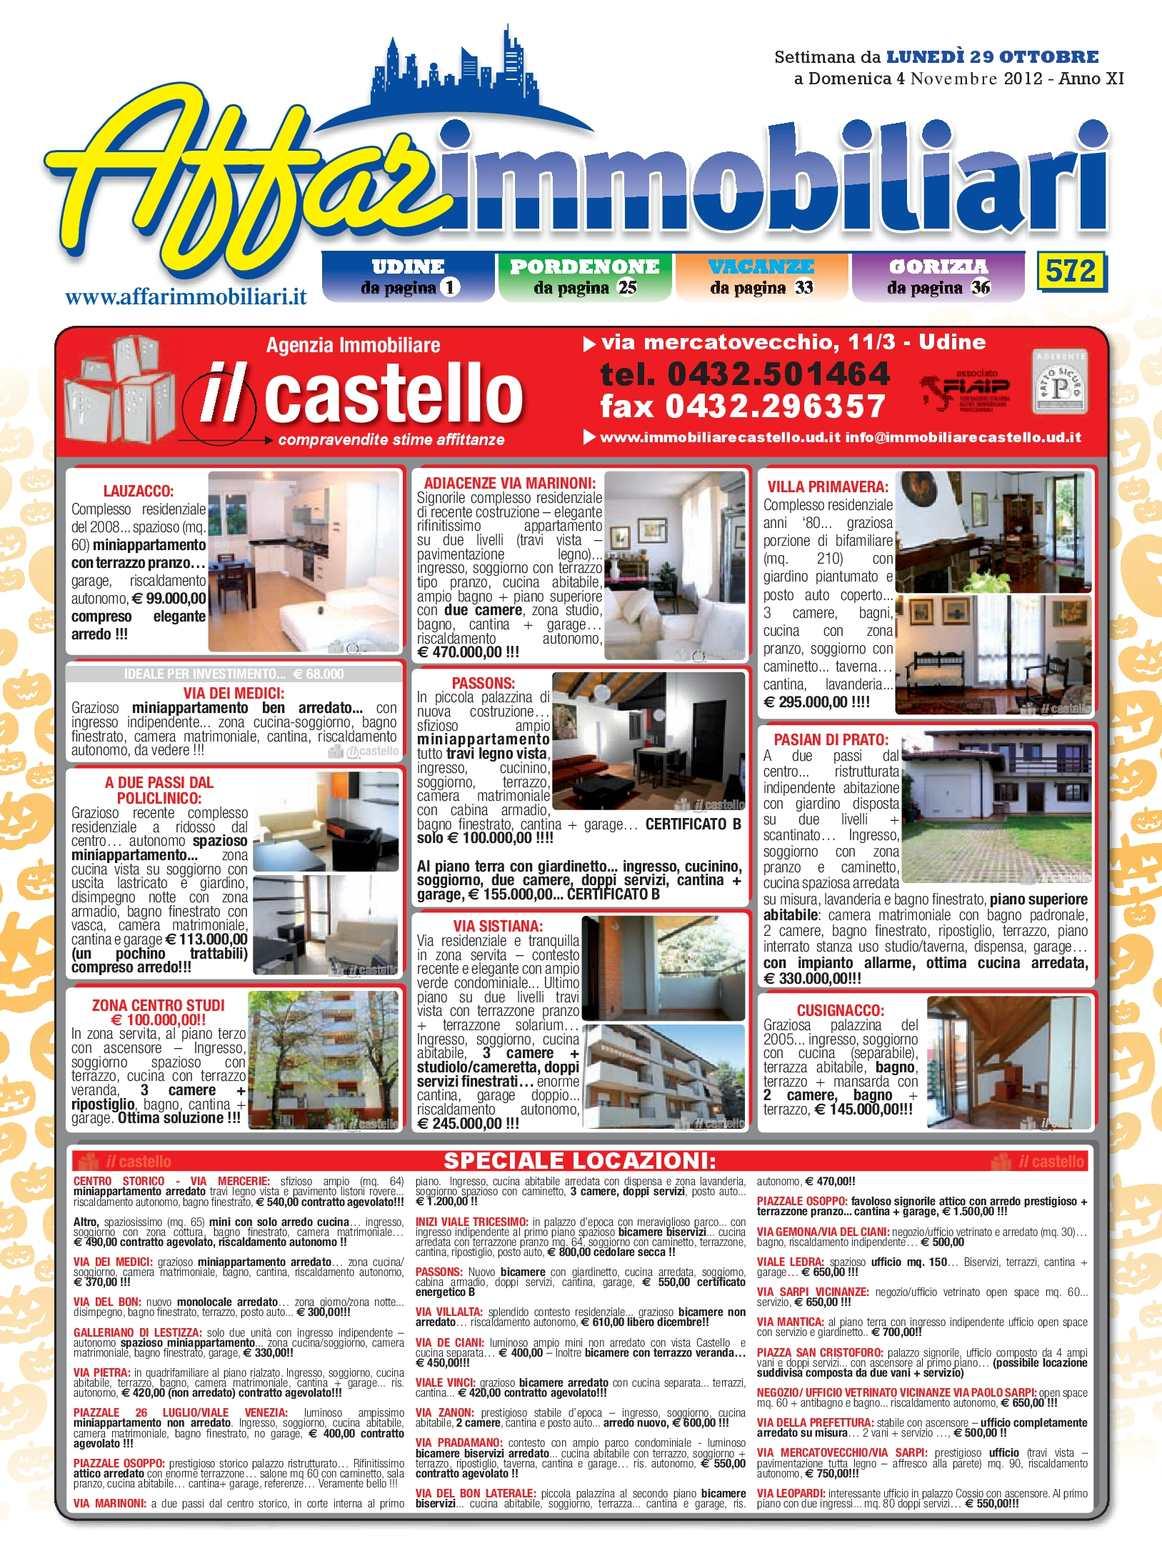 Calaméo Affarimmobiliari 572 Del 29 Ottobre 2012